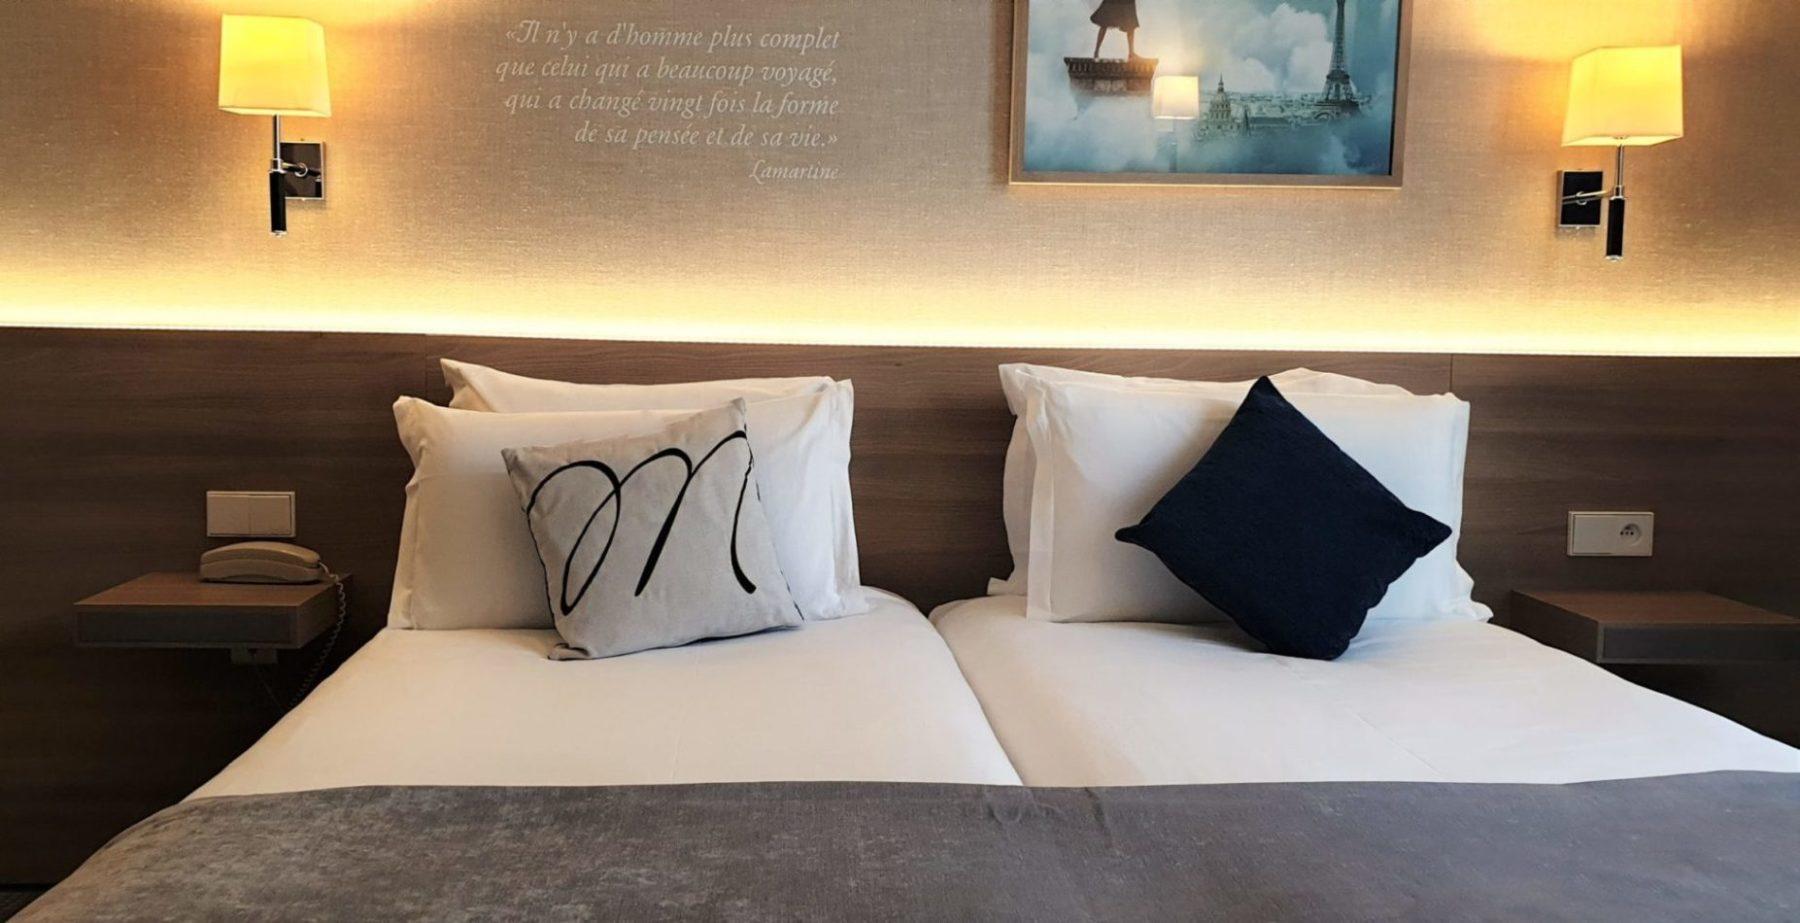 Chambre twin - Hôtel magda champs-élysées (2)